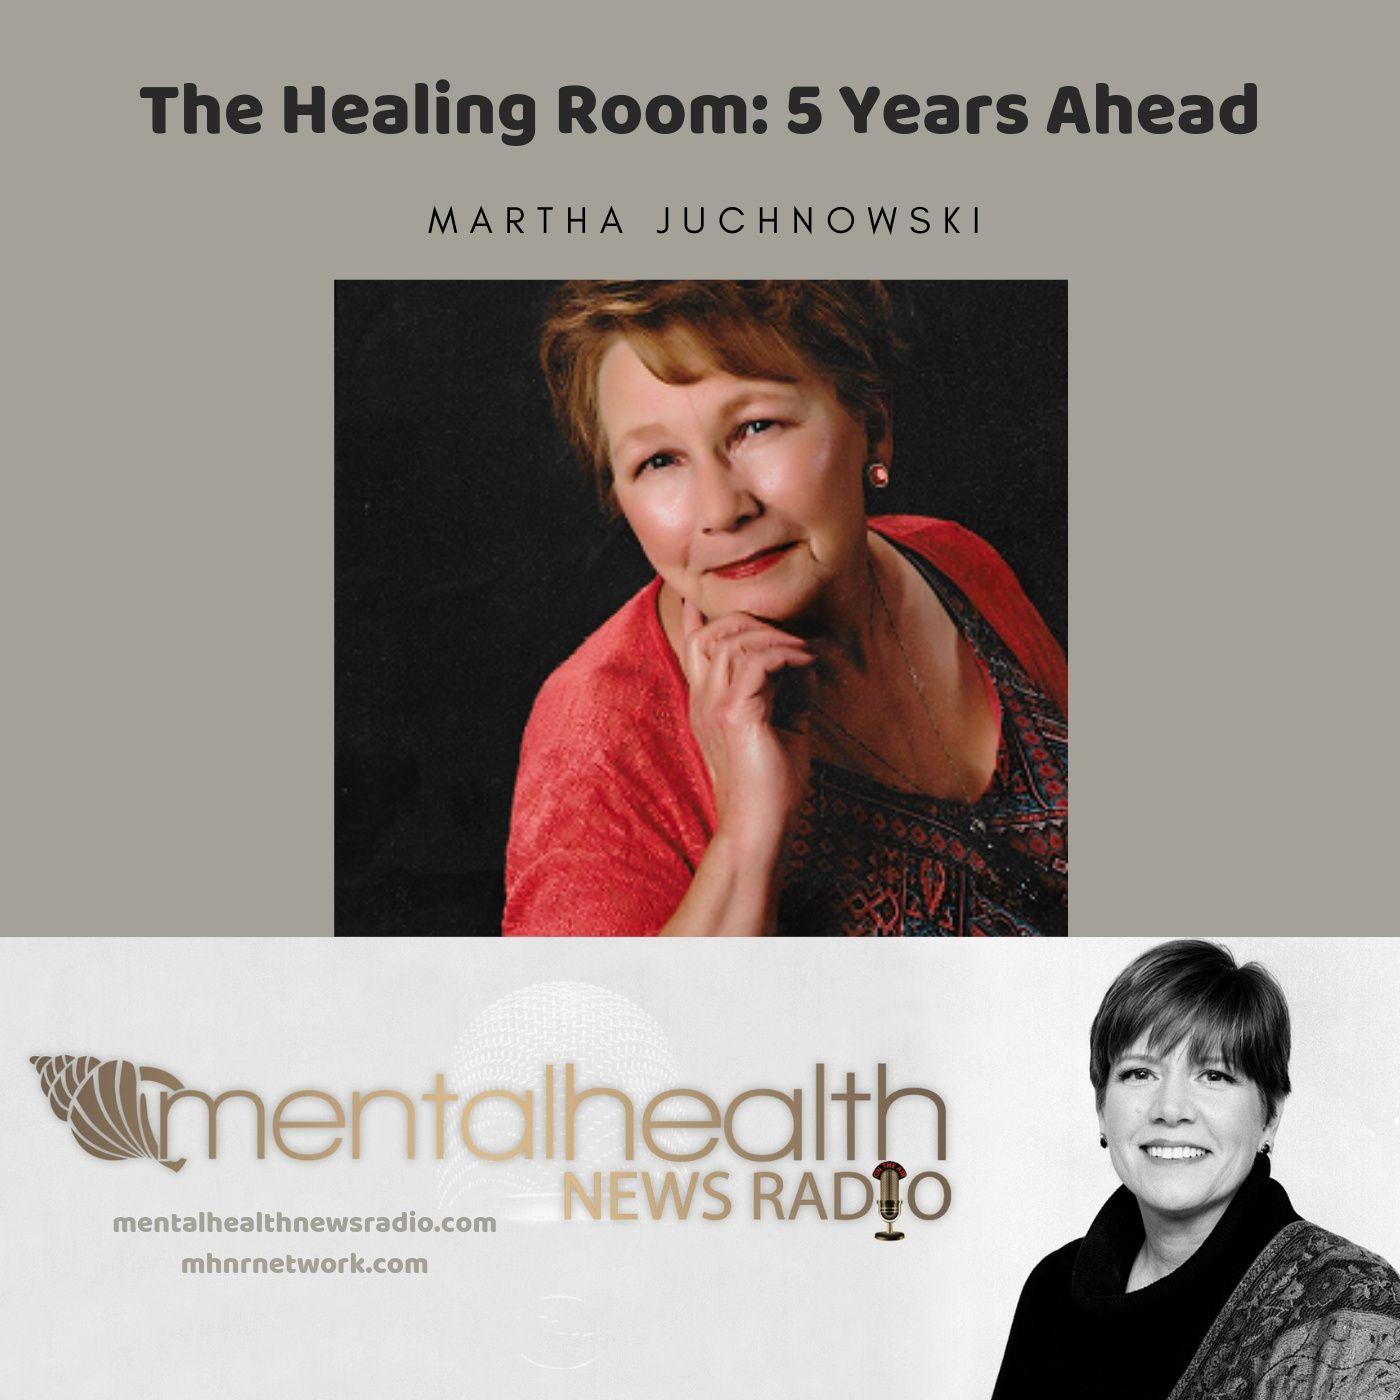 Mental Health News Radio - The Healing Room: 5 Years Ahead